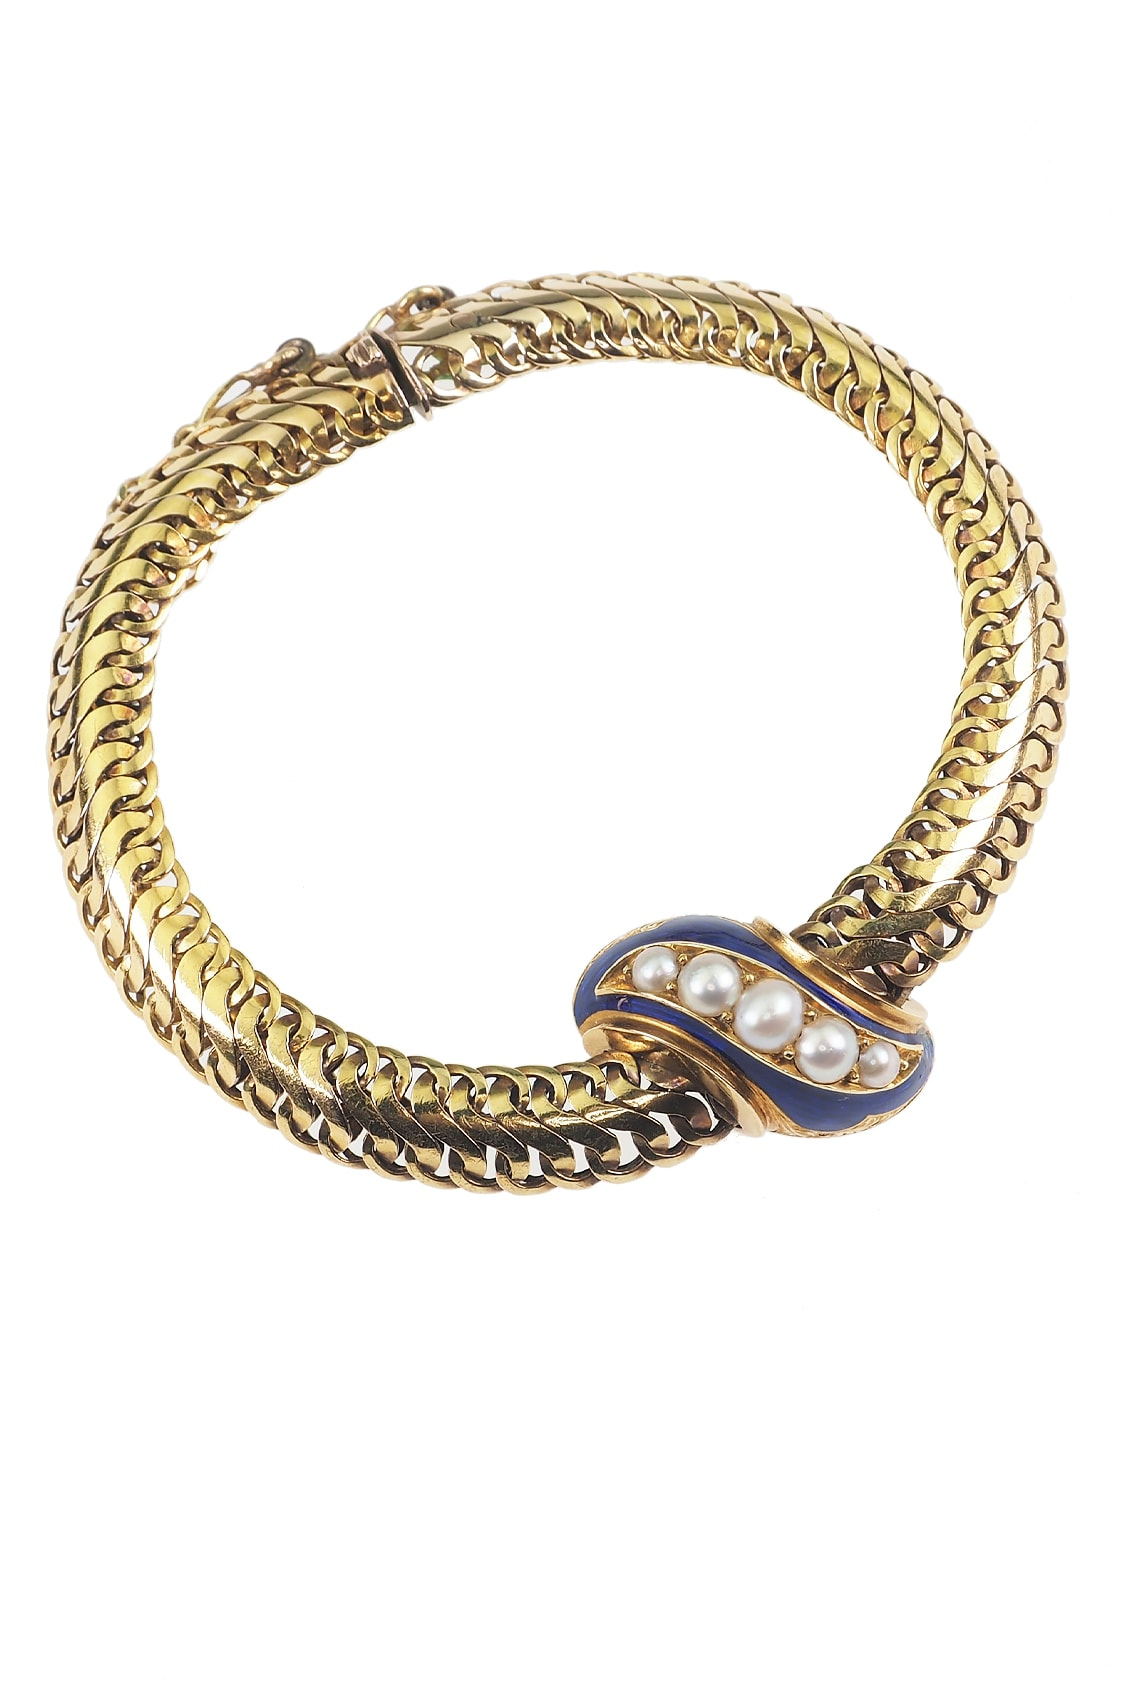 antikschmuck-armband-0504